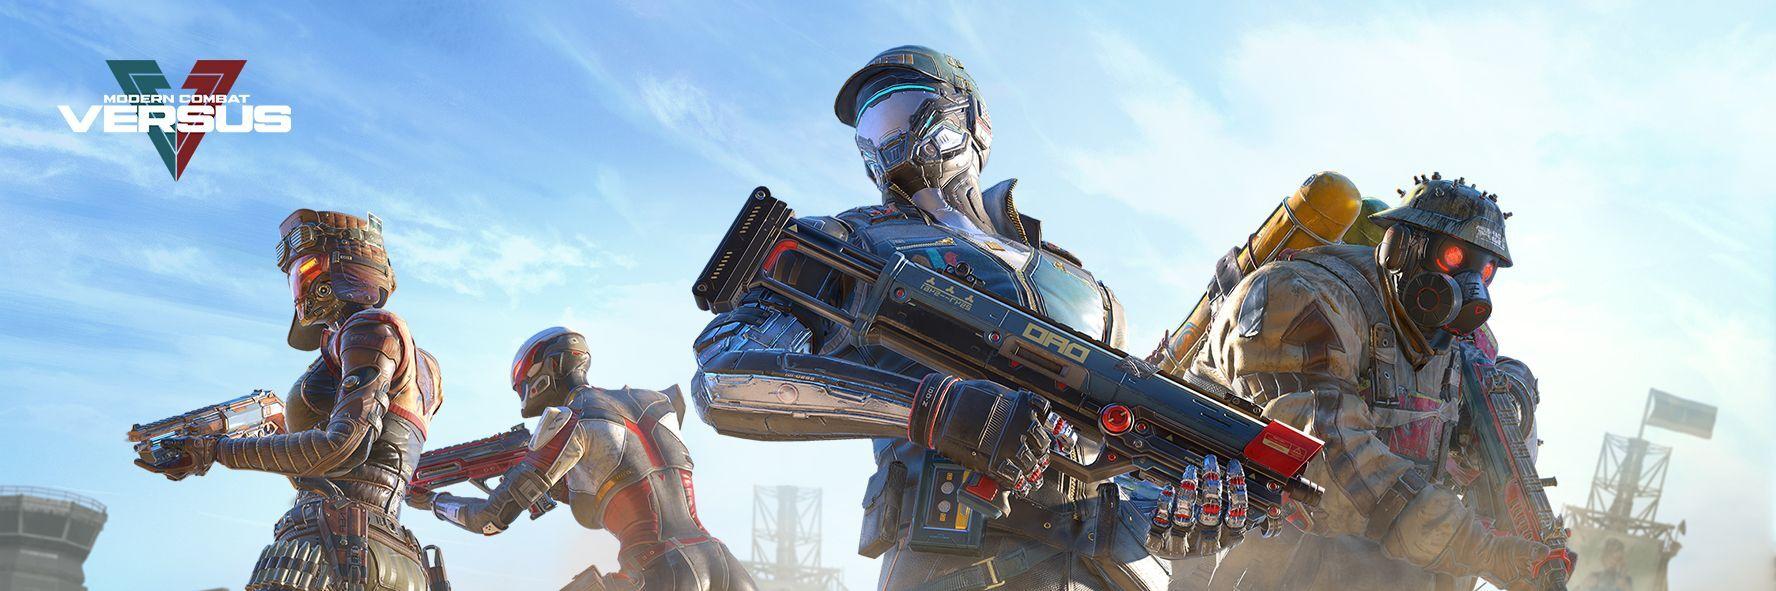 Modern Combat Versus: New Online Multiplayer FPS cover